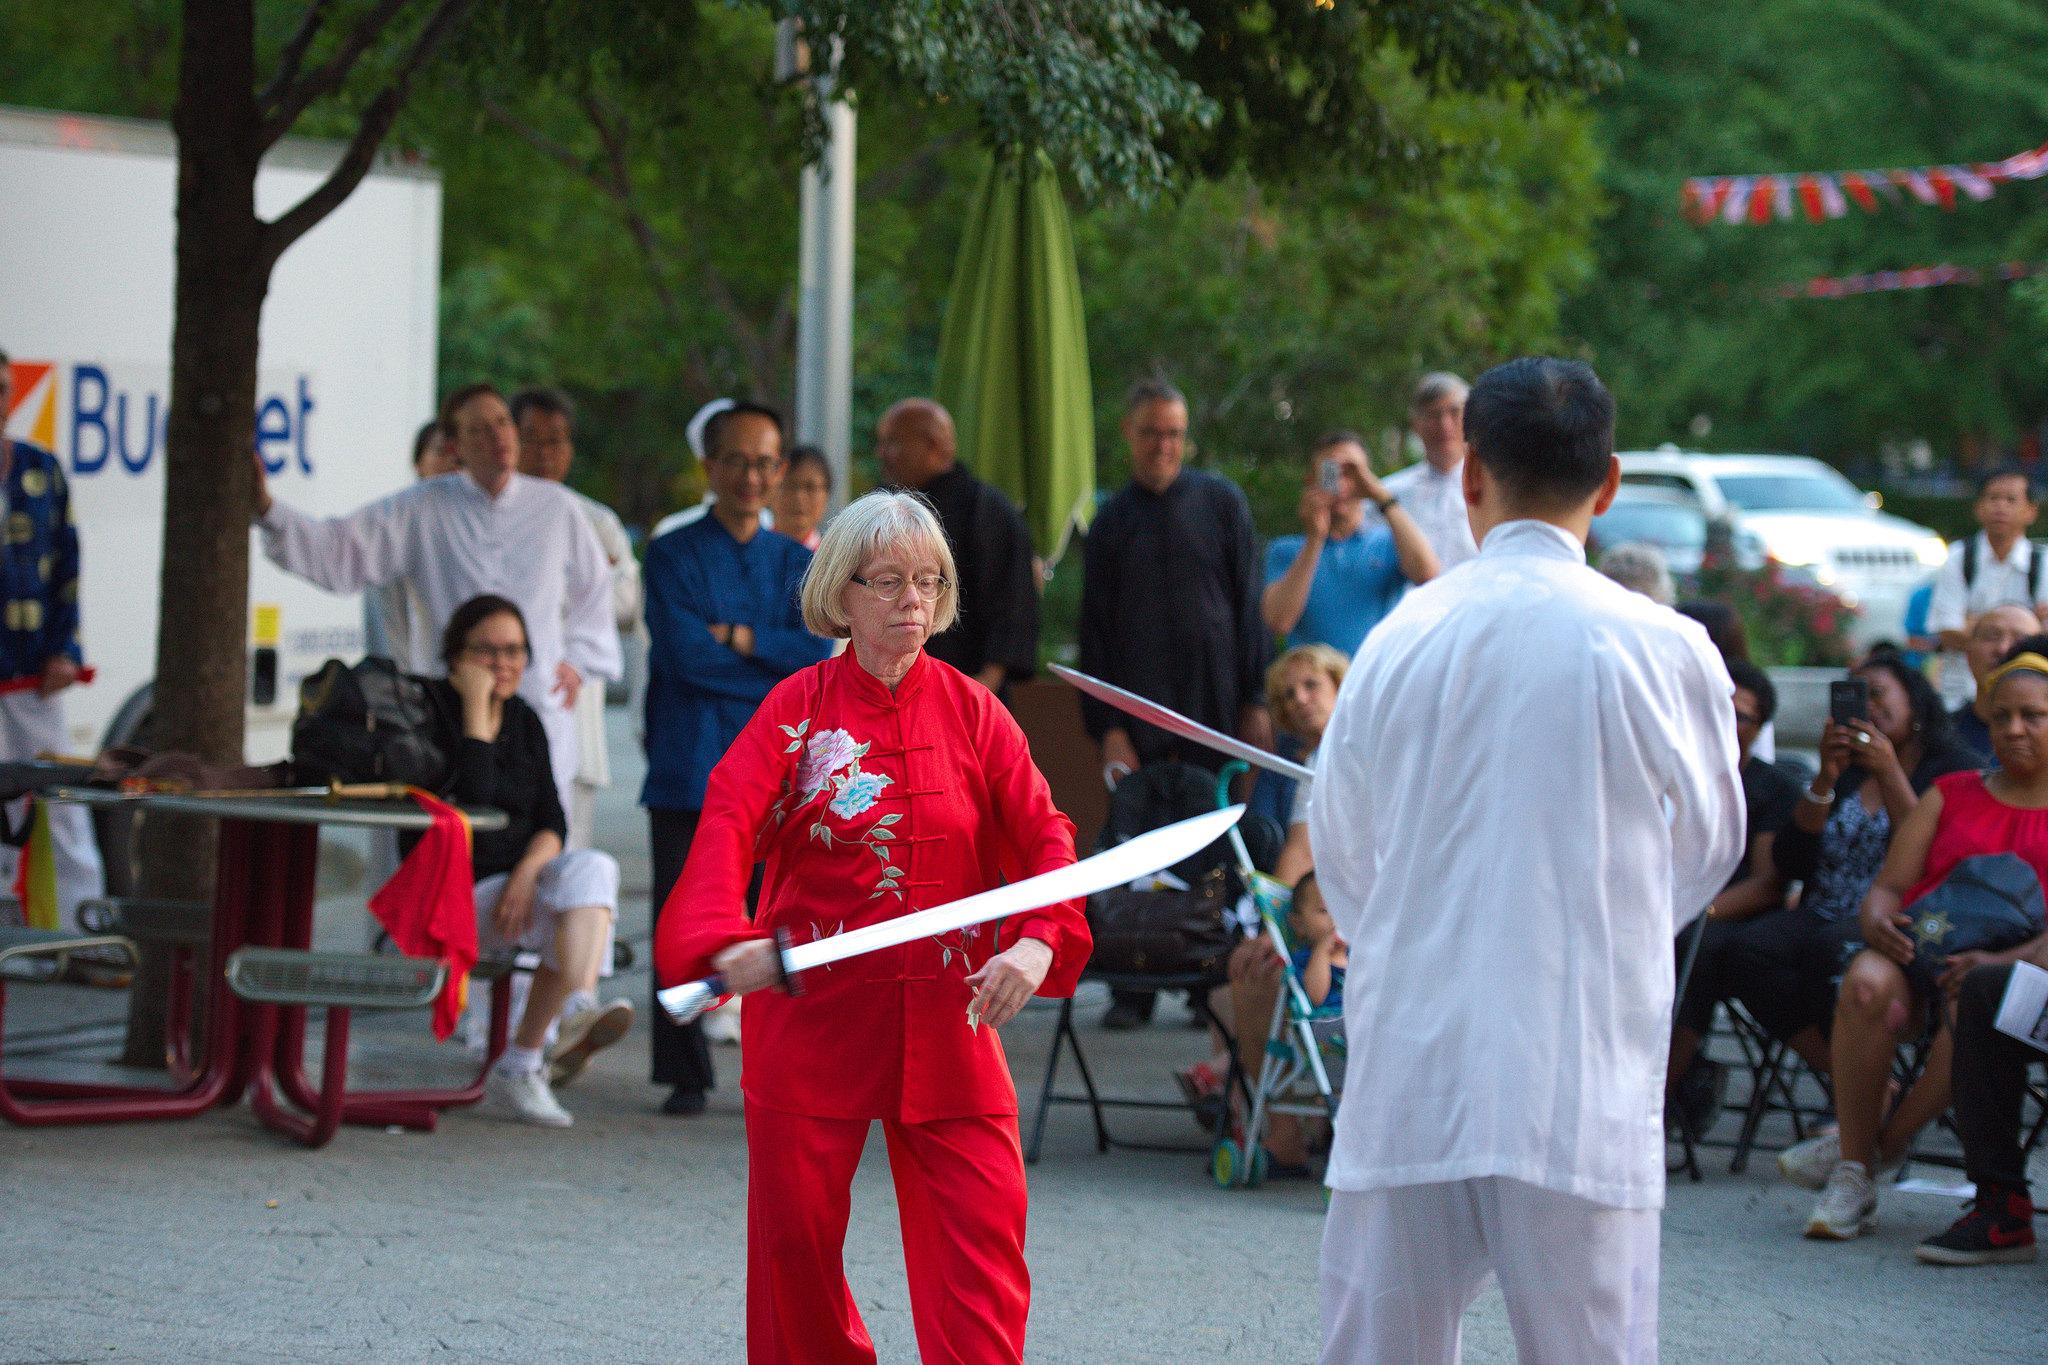 Martial Arts_Bow Sim Mark Jean3.jpg